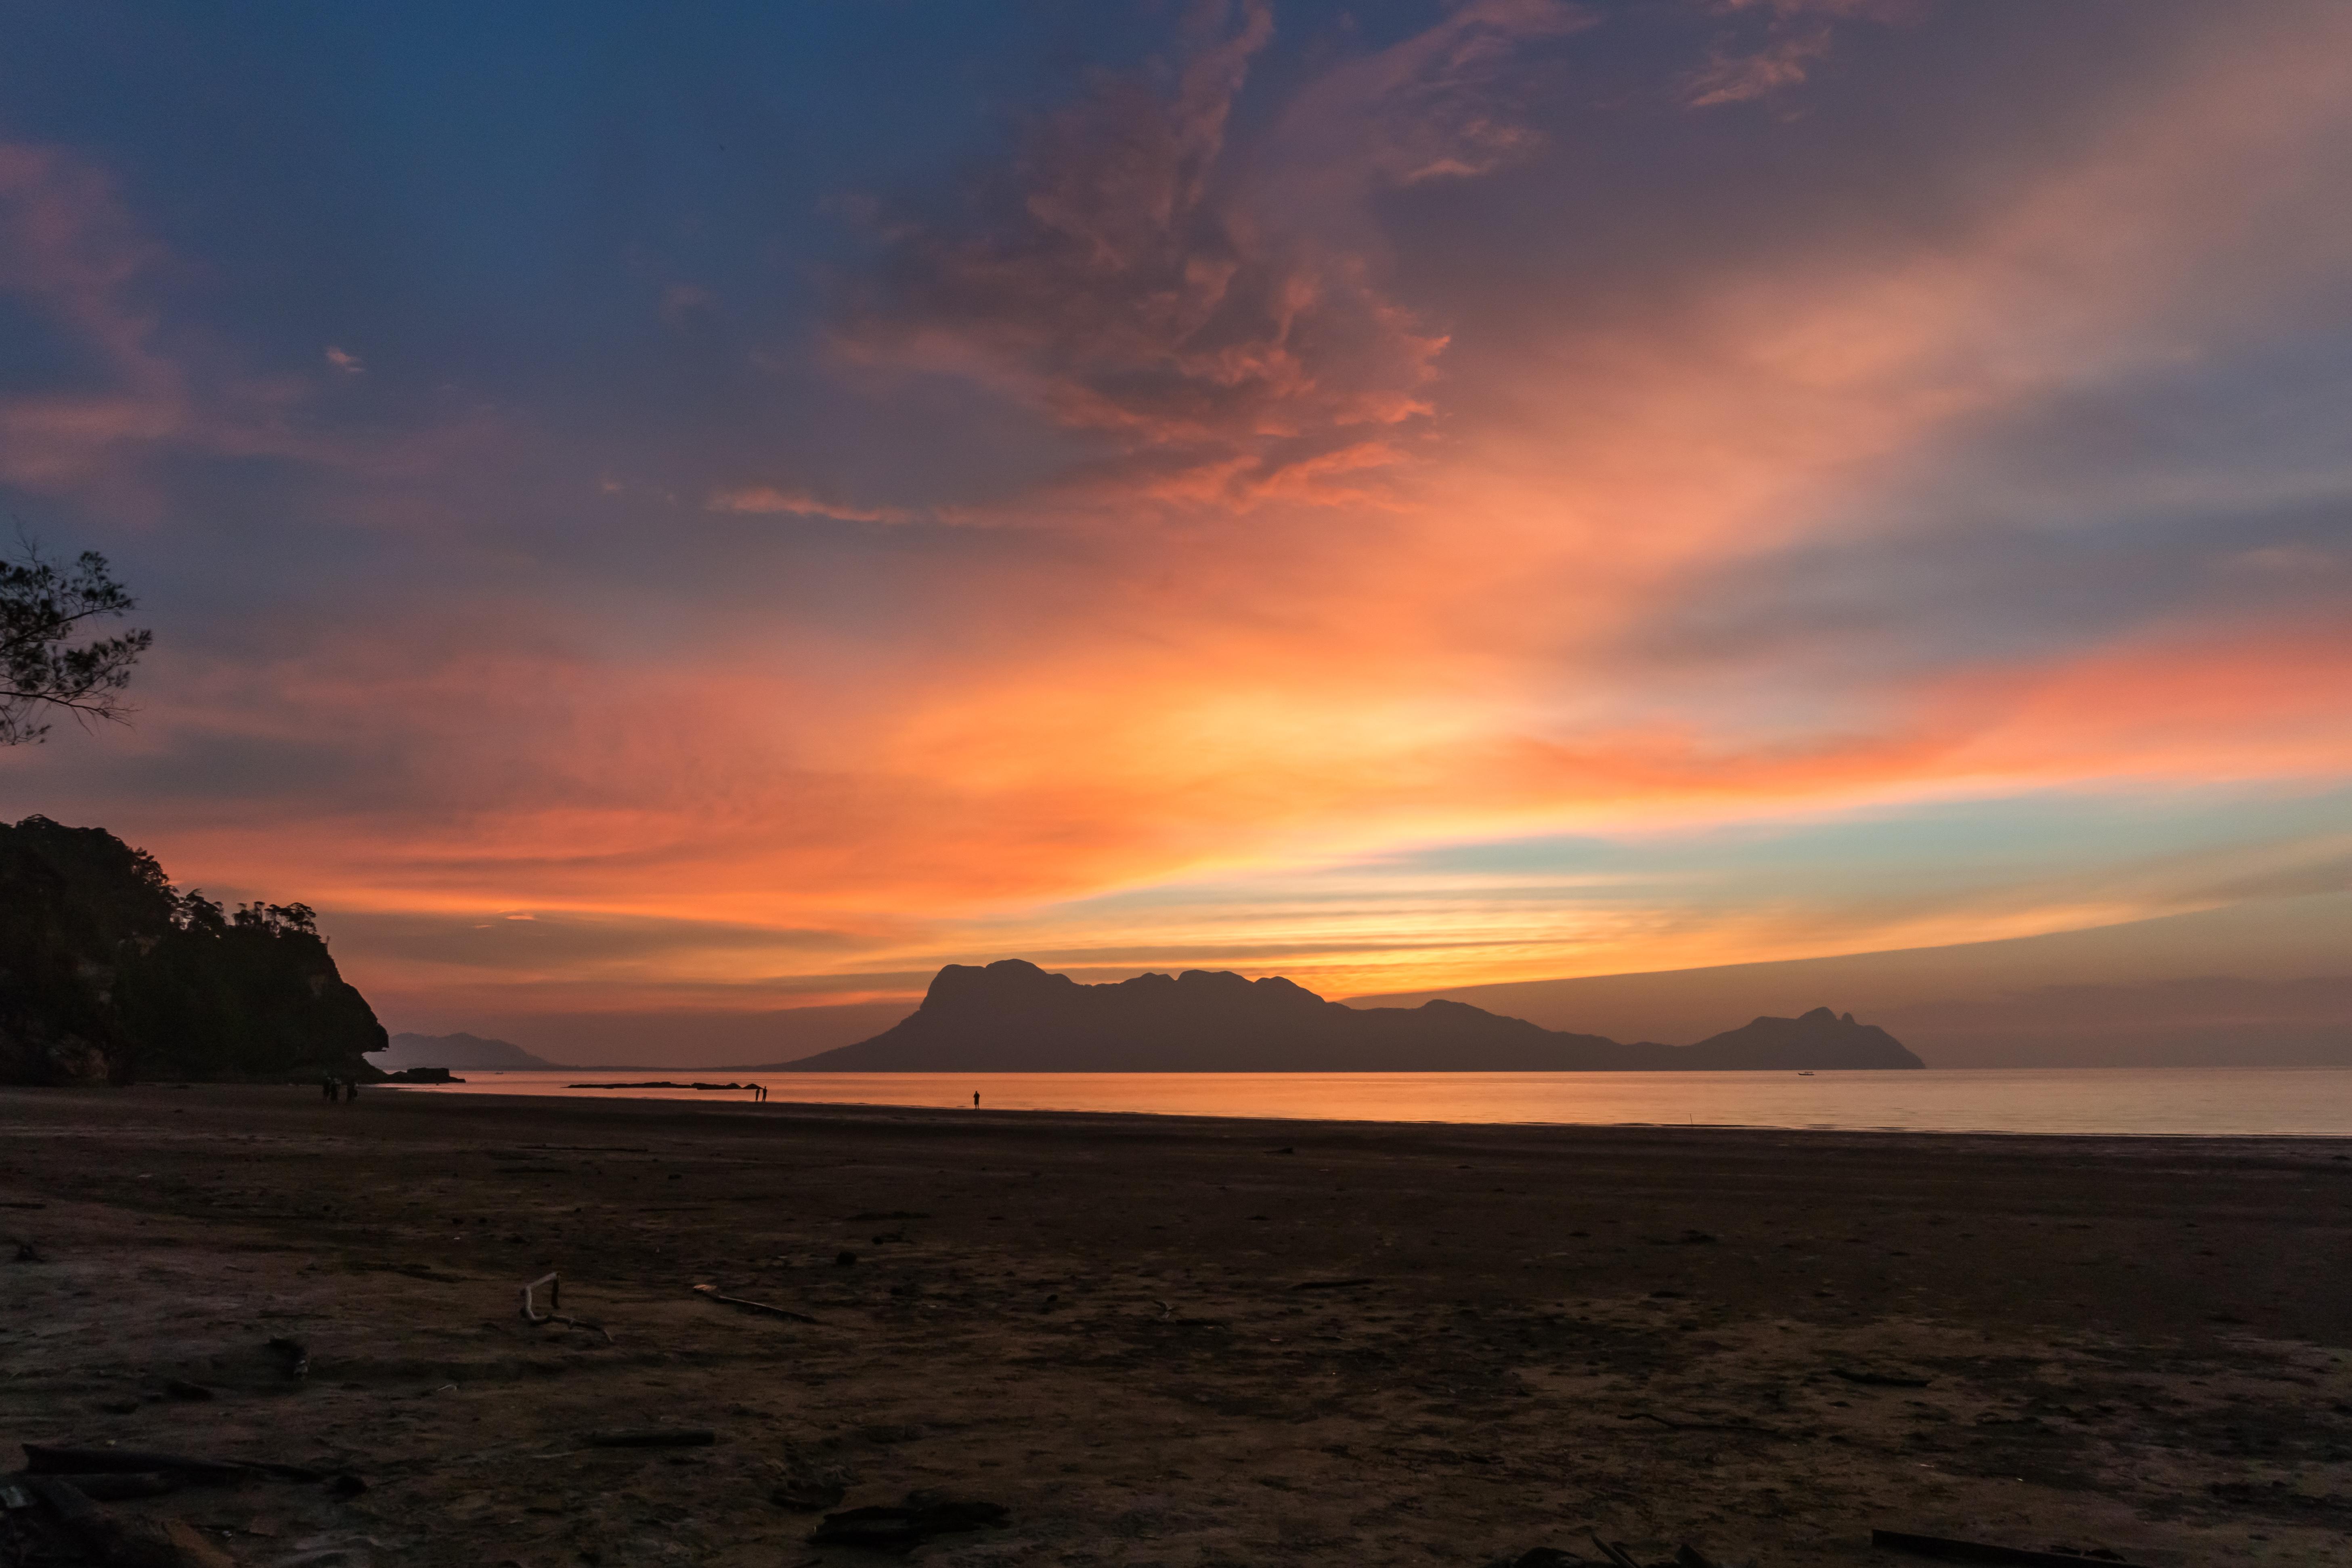 traumhafter Sonnenuntergang im Bako Nationalpark